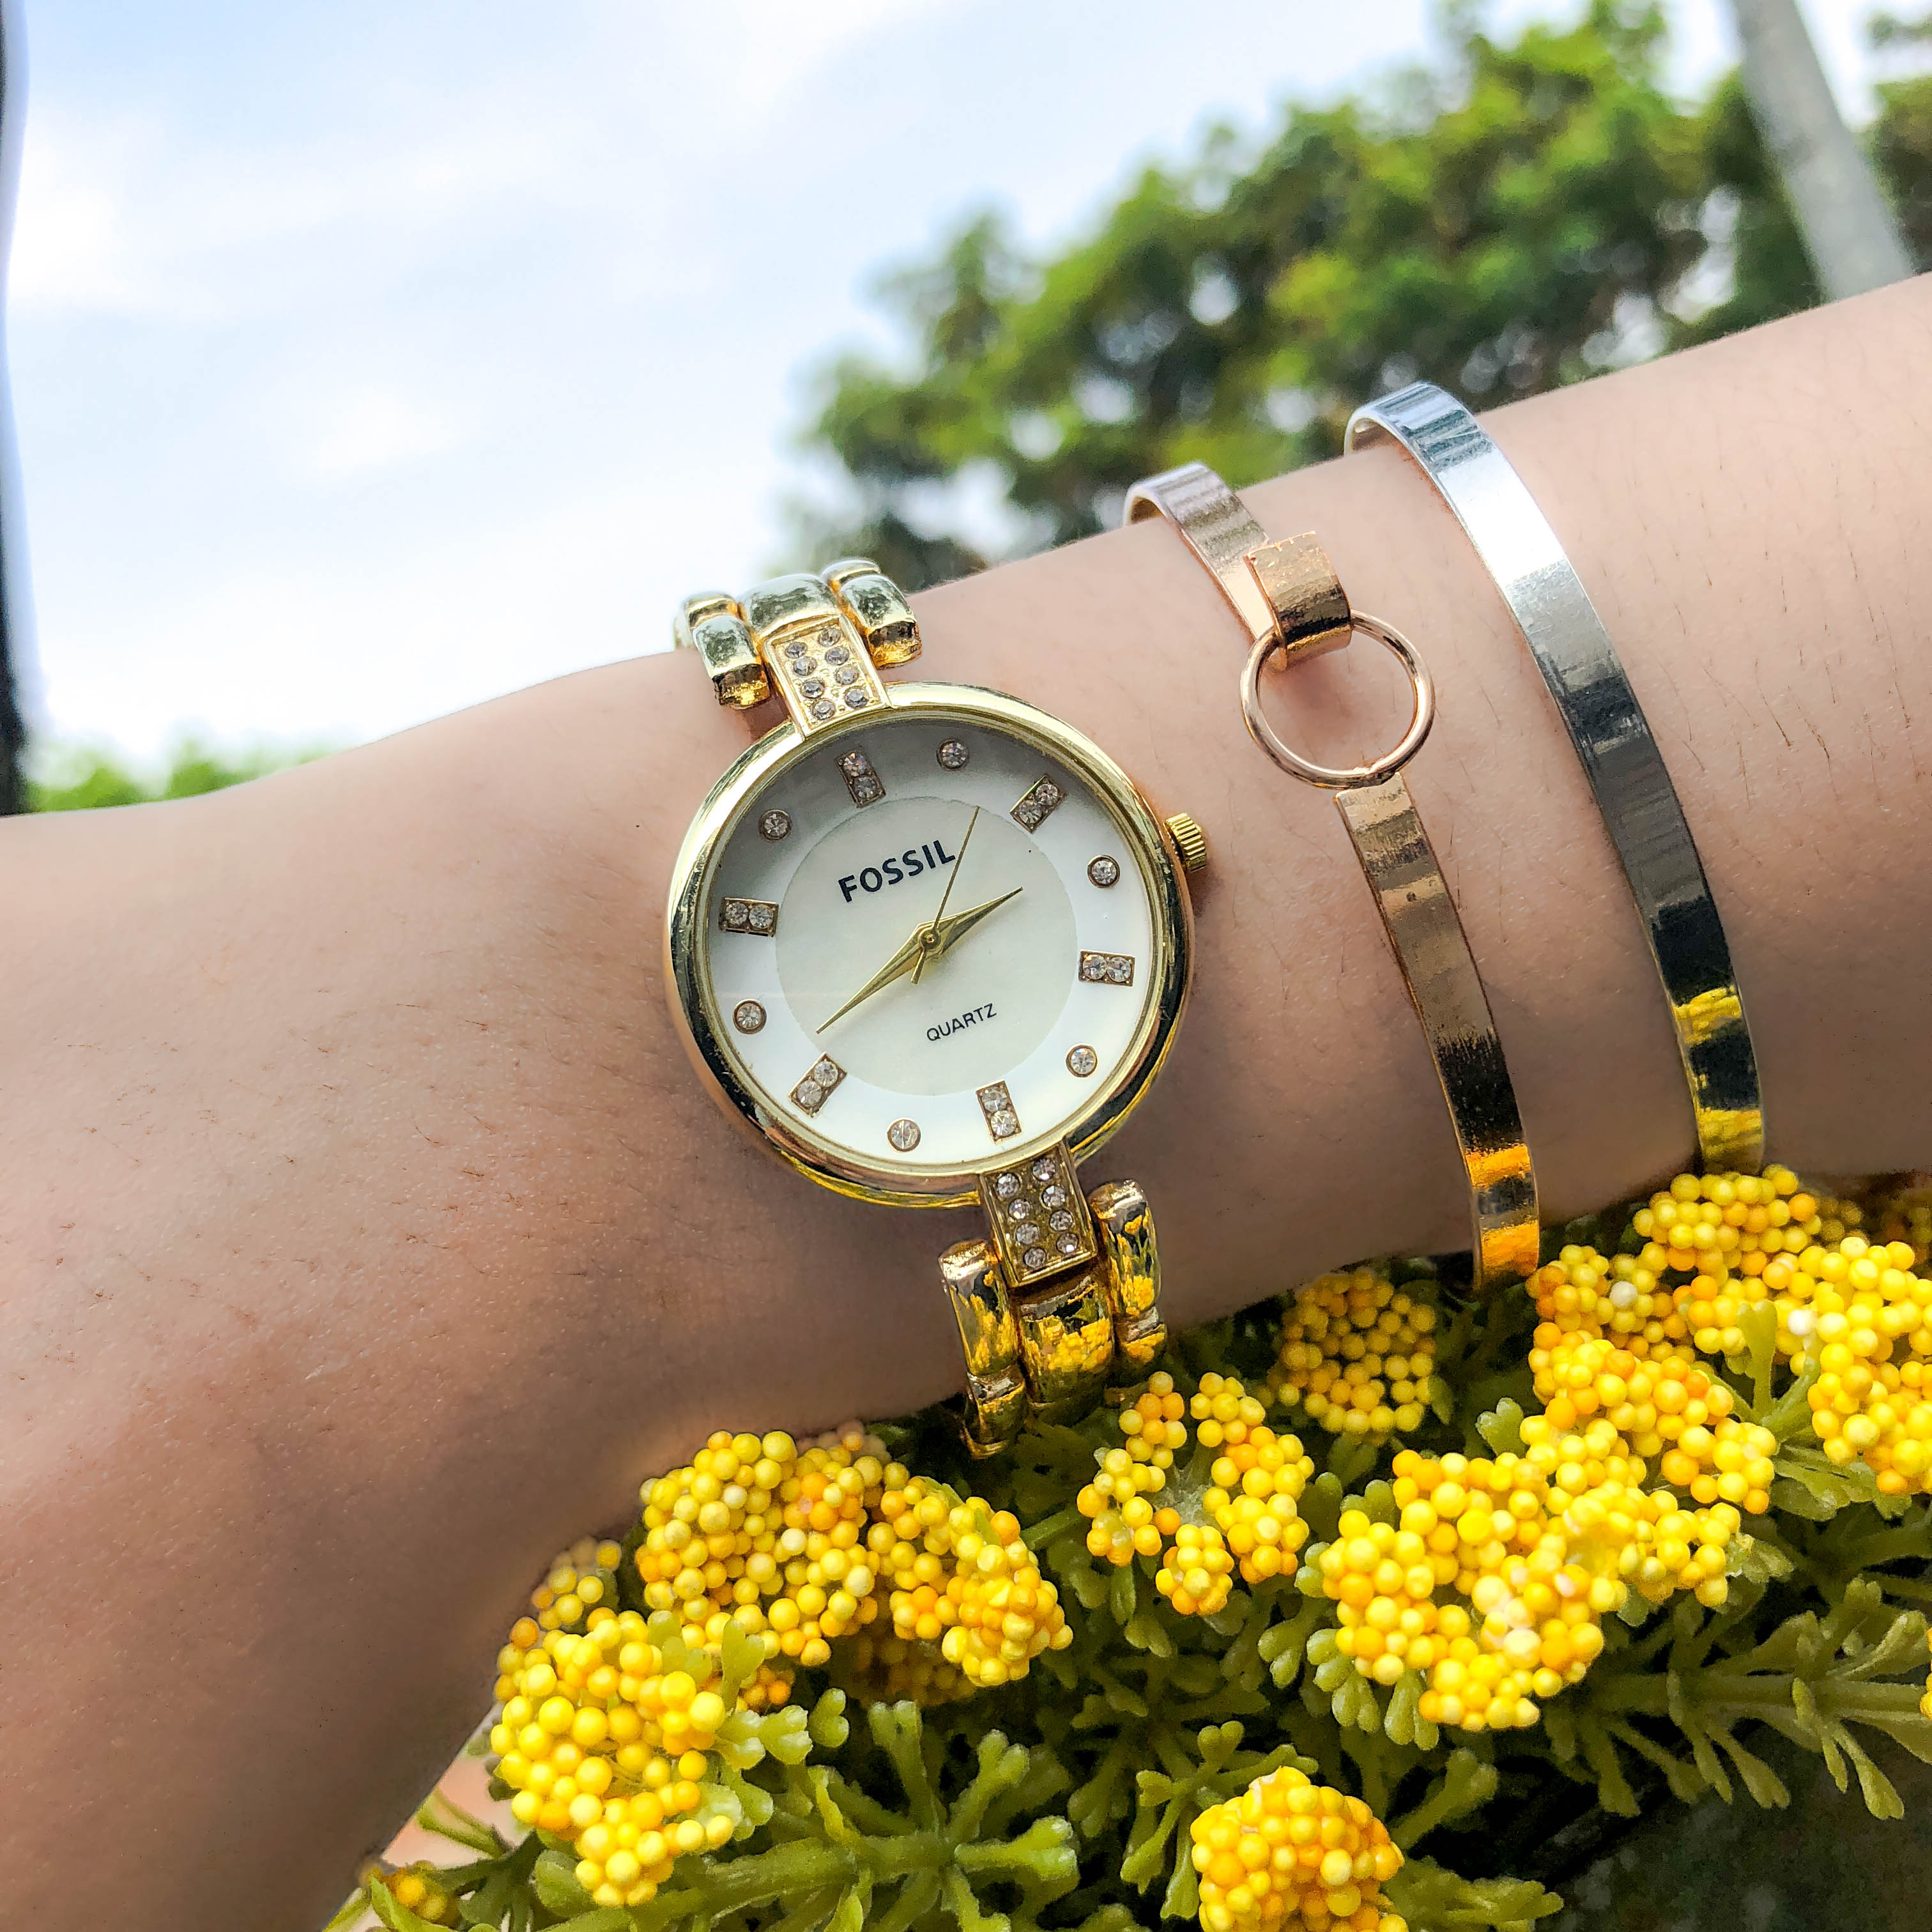 Jam Tangan Fos Fashion Watch Chain Gold Frame Gold Dial Gold Band FOSC03